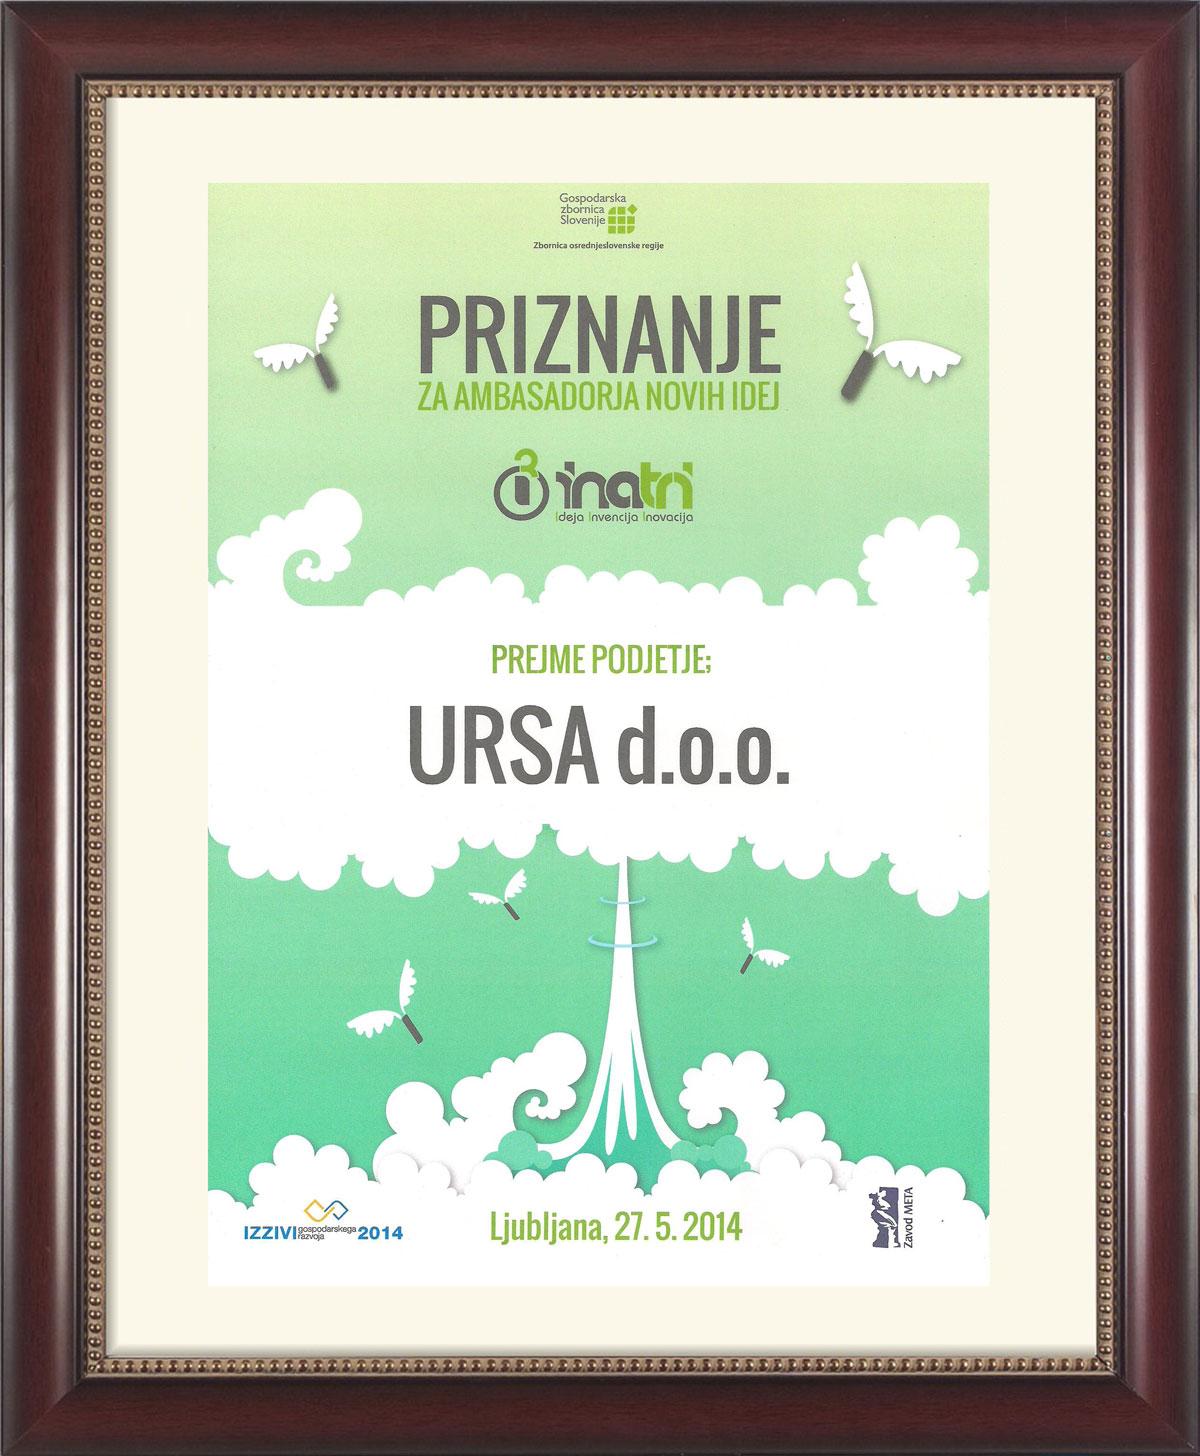 URSAdoo-Medved-Prislan-ambasador-novih-idej